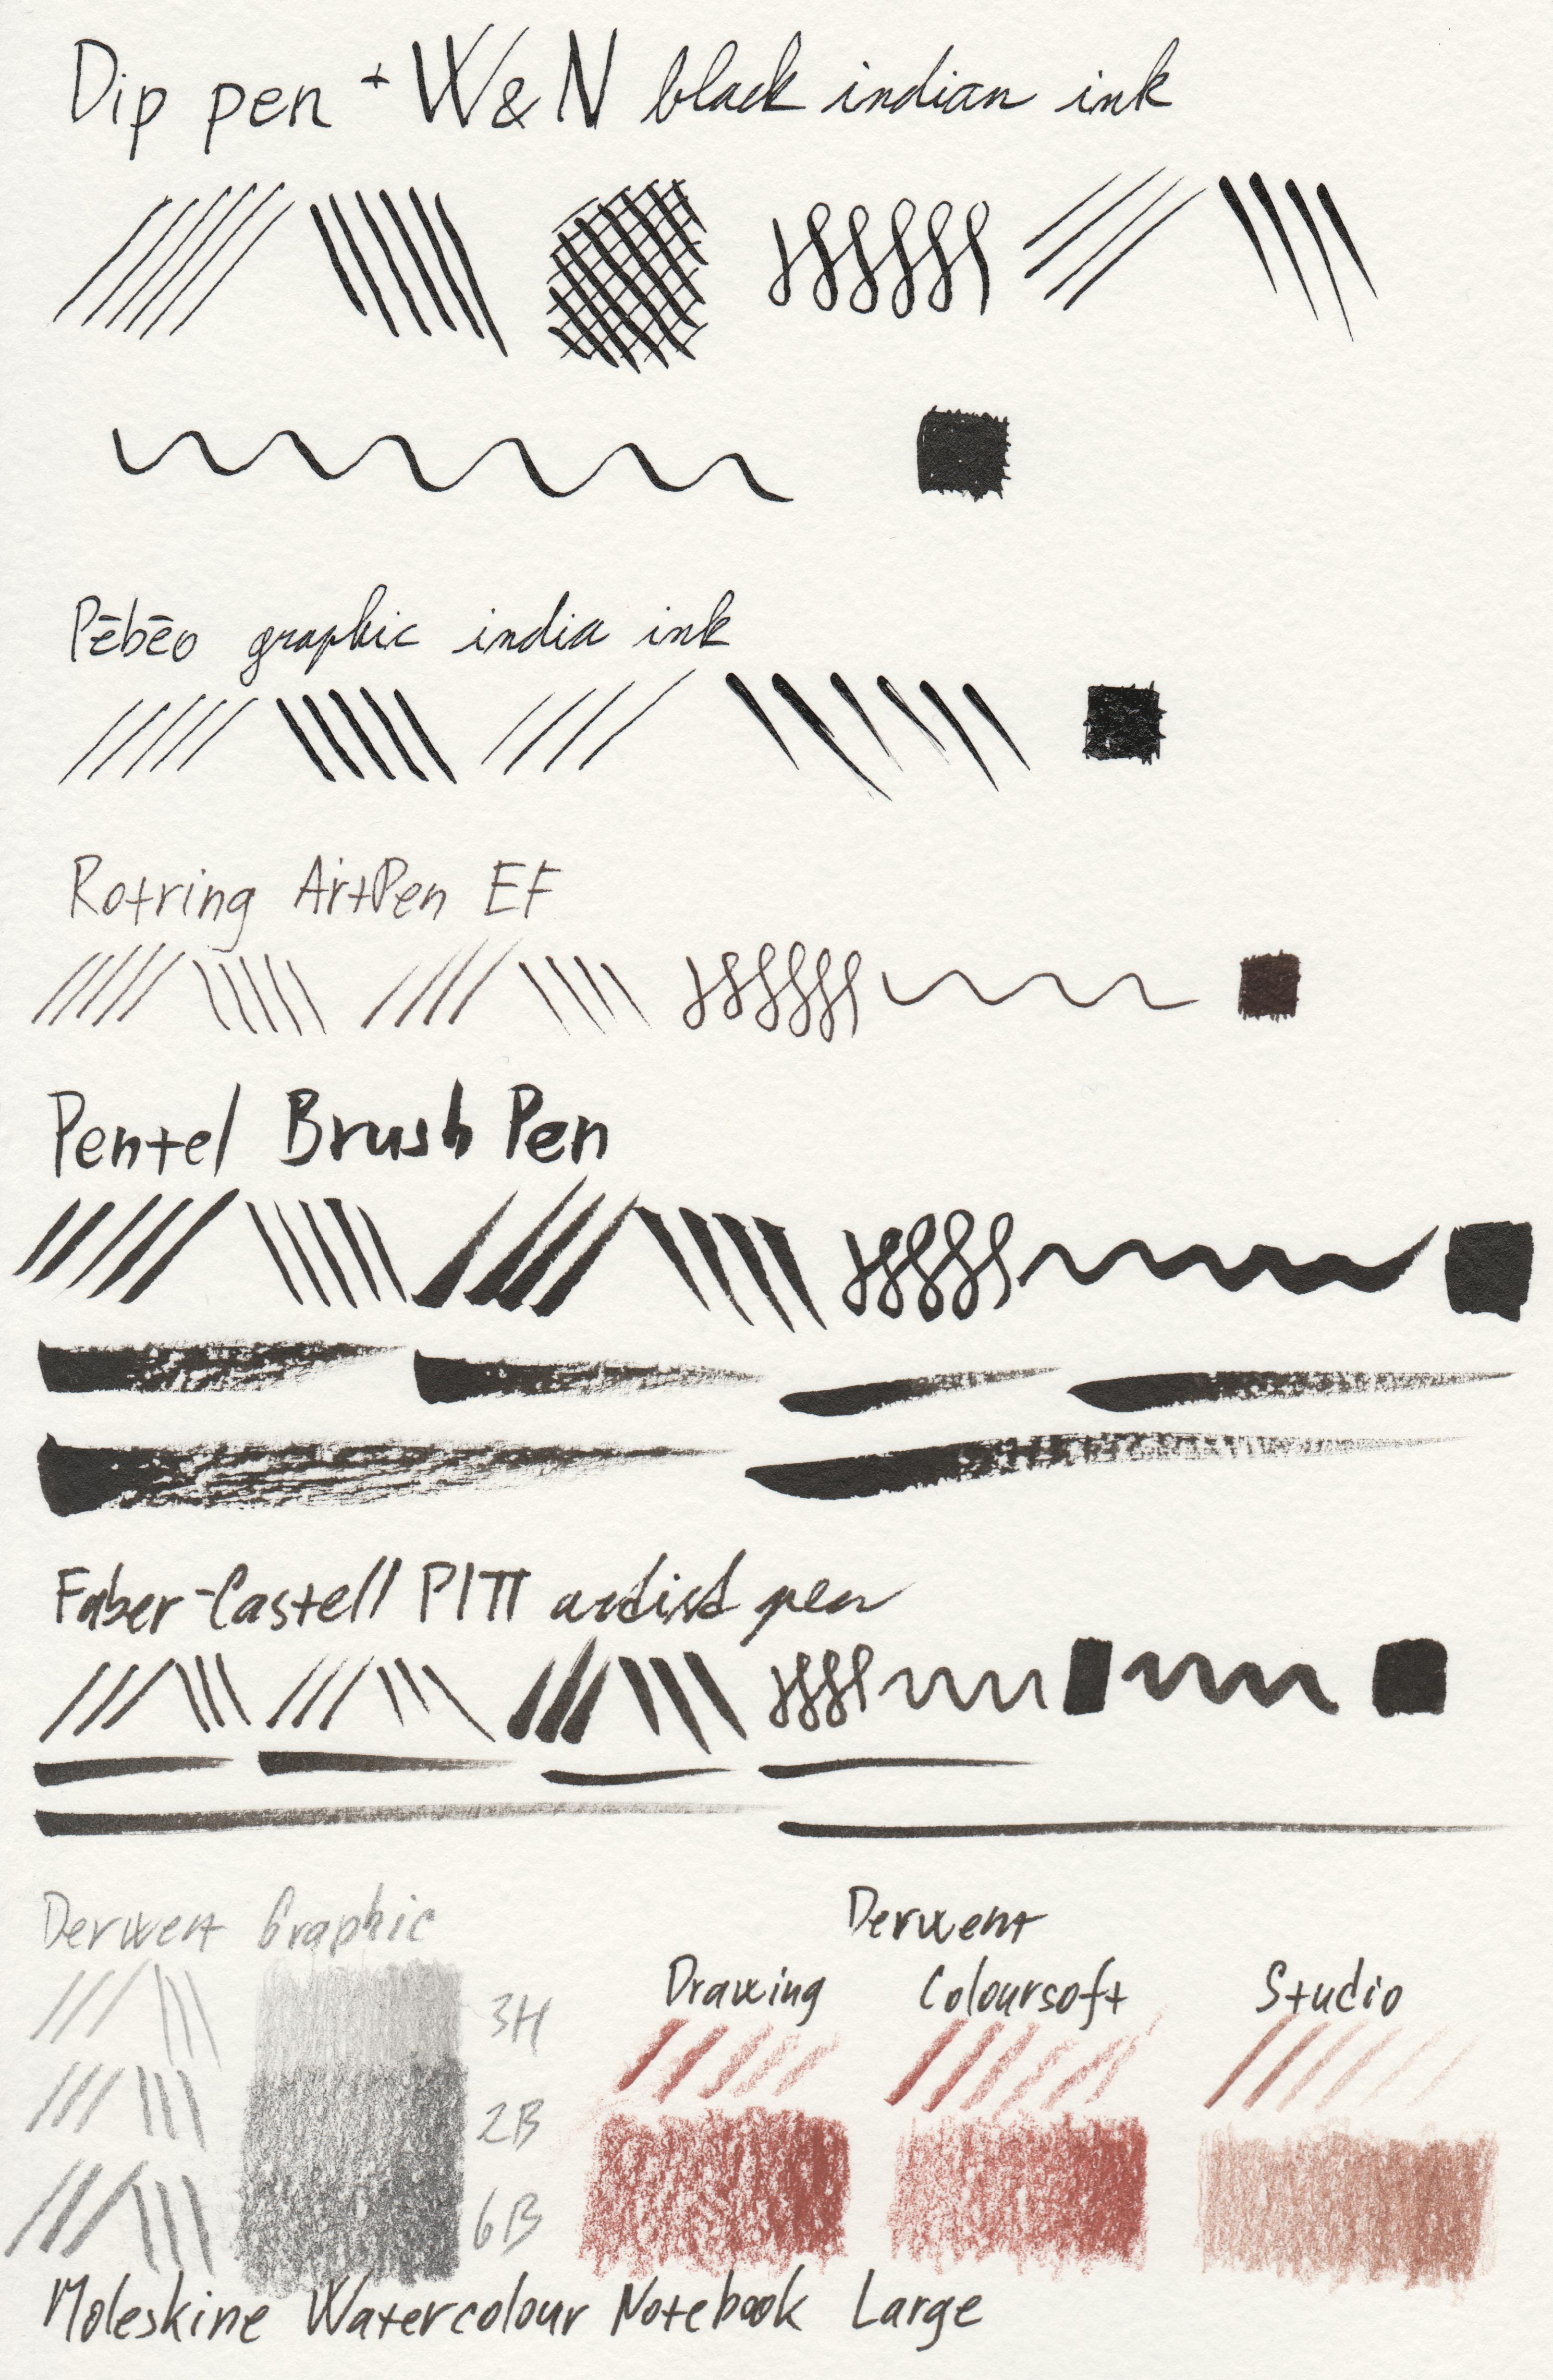 Paper test - Moleskine Watercolour Notebook Large